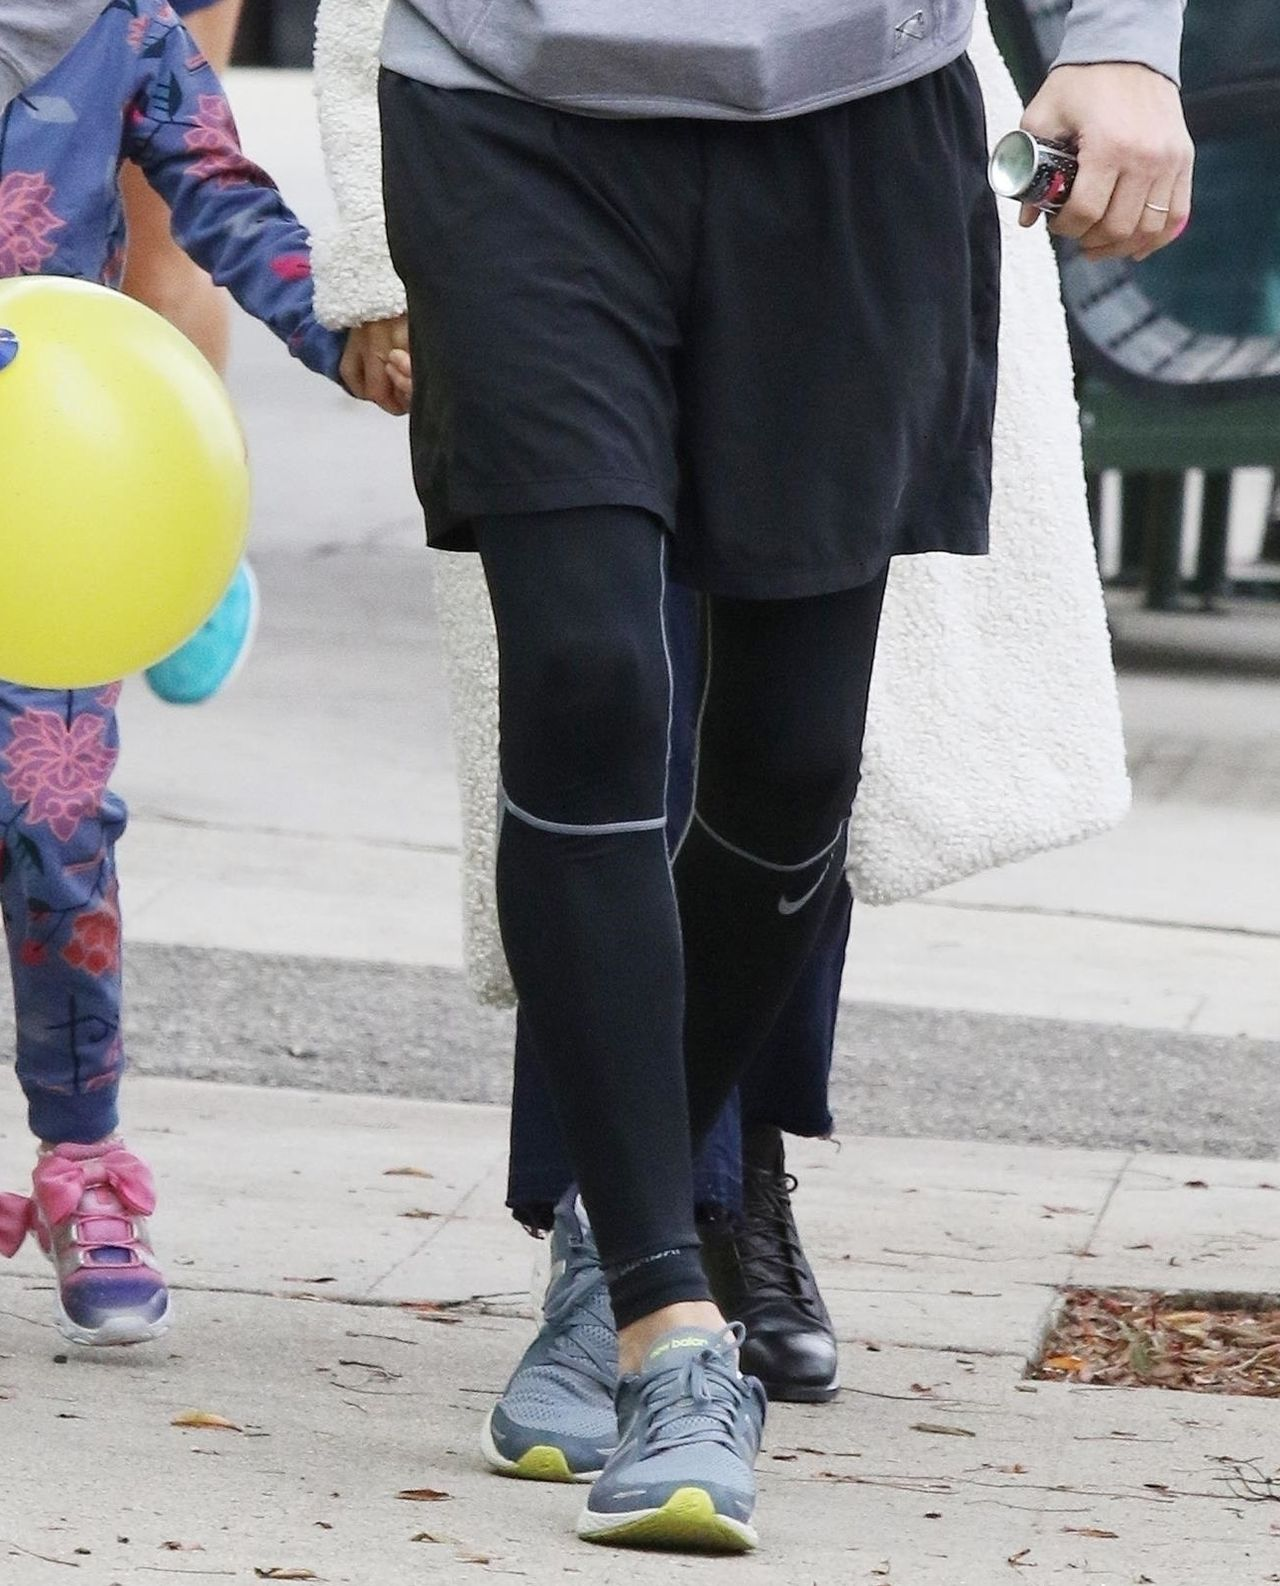 Moja babcia na widok Ashtona Kutchera i Mili Kunis: Czy oni są bezdomni? (ZDJĘCIA)